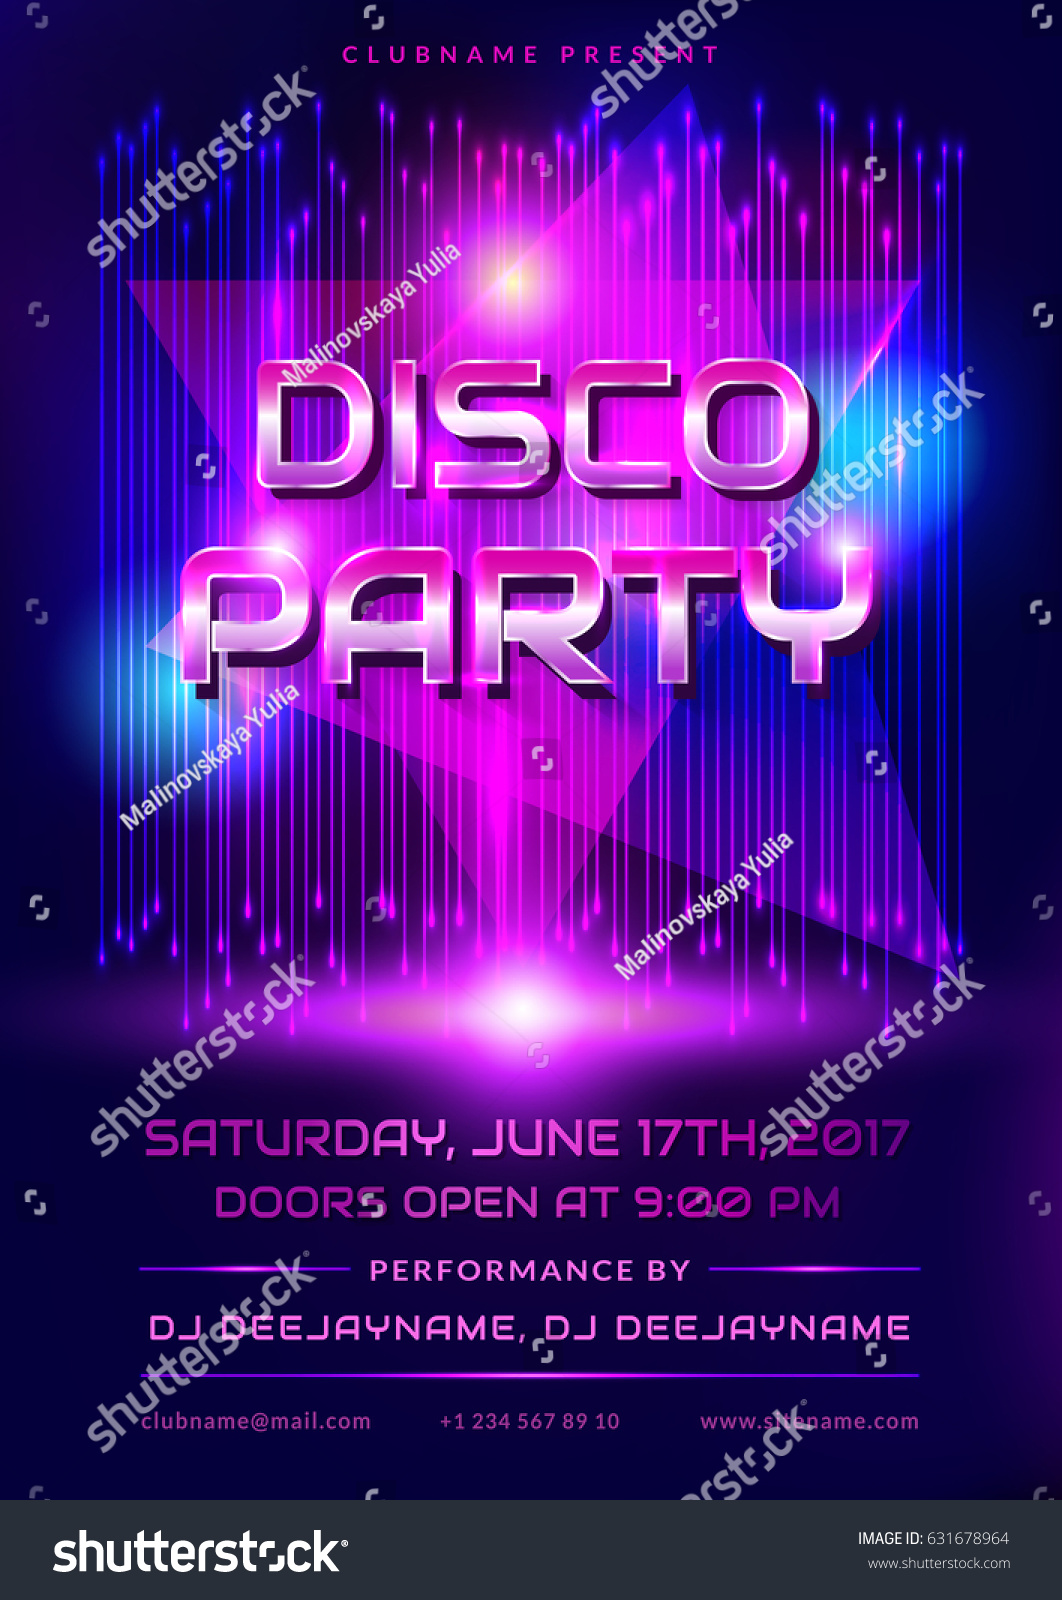 Colorful Flyer Disco Party Invitation Shiny Stock Vector 631678964 ...